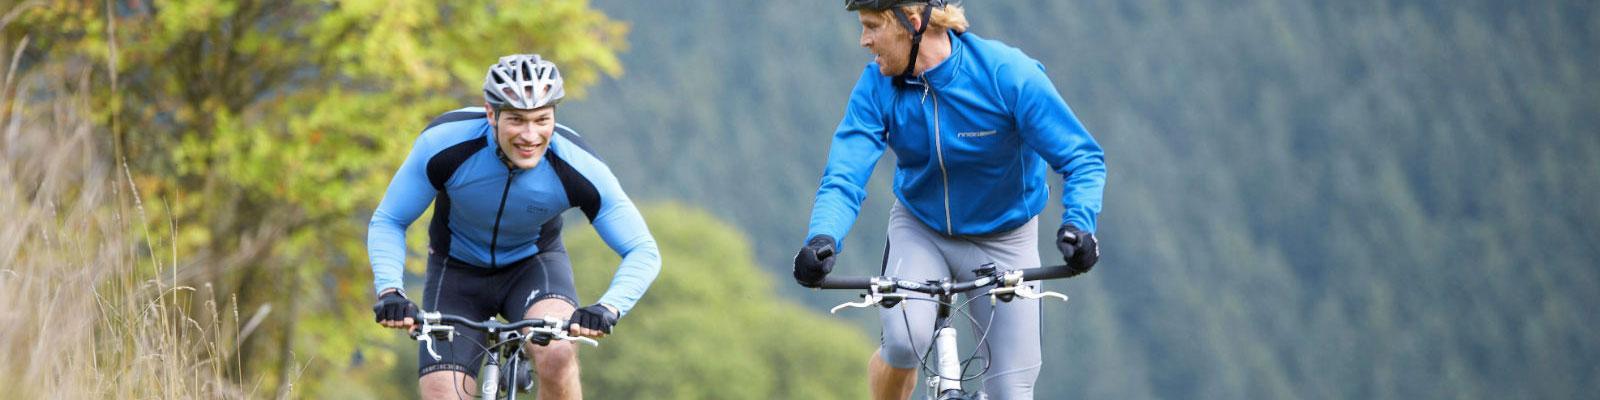 Radfahrer Eifel